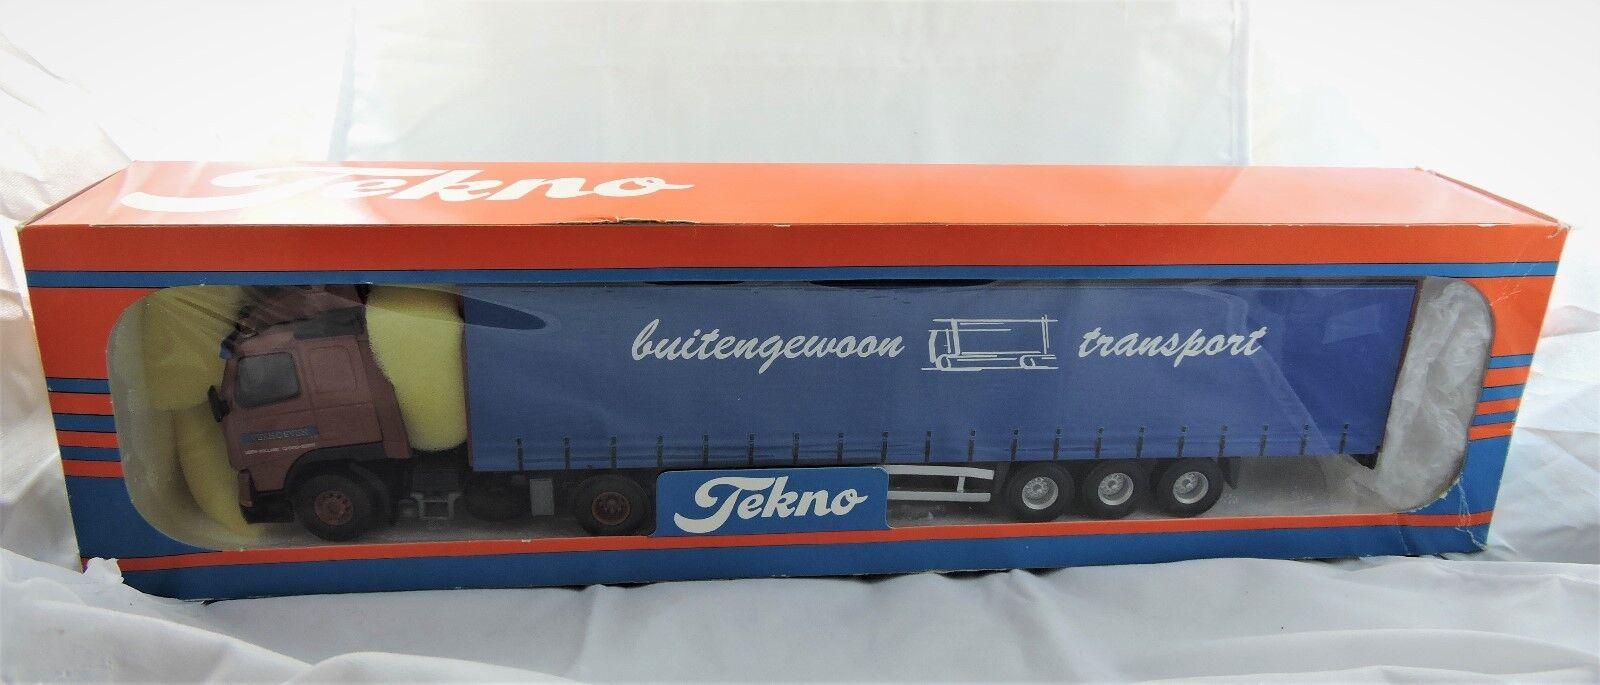 Boxed Tekno 1 50 Buitengewoon transport hauler Mint in box